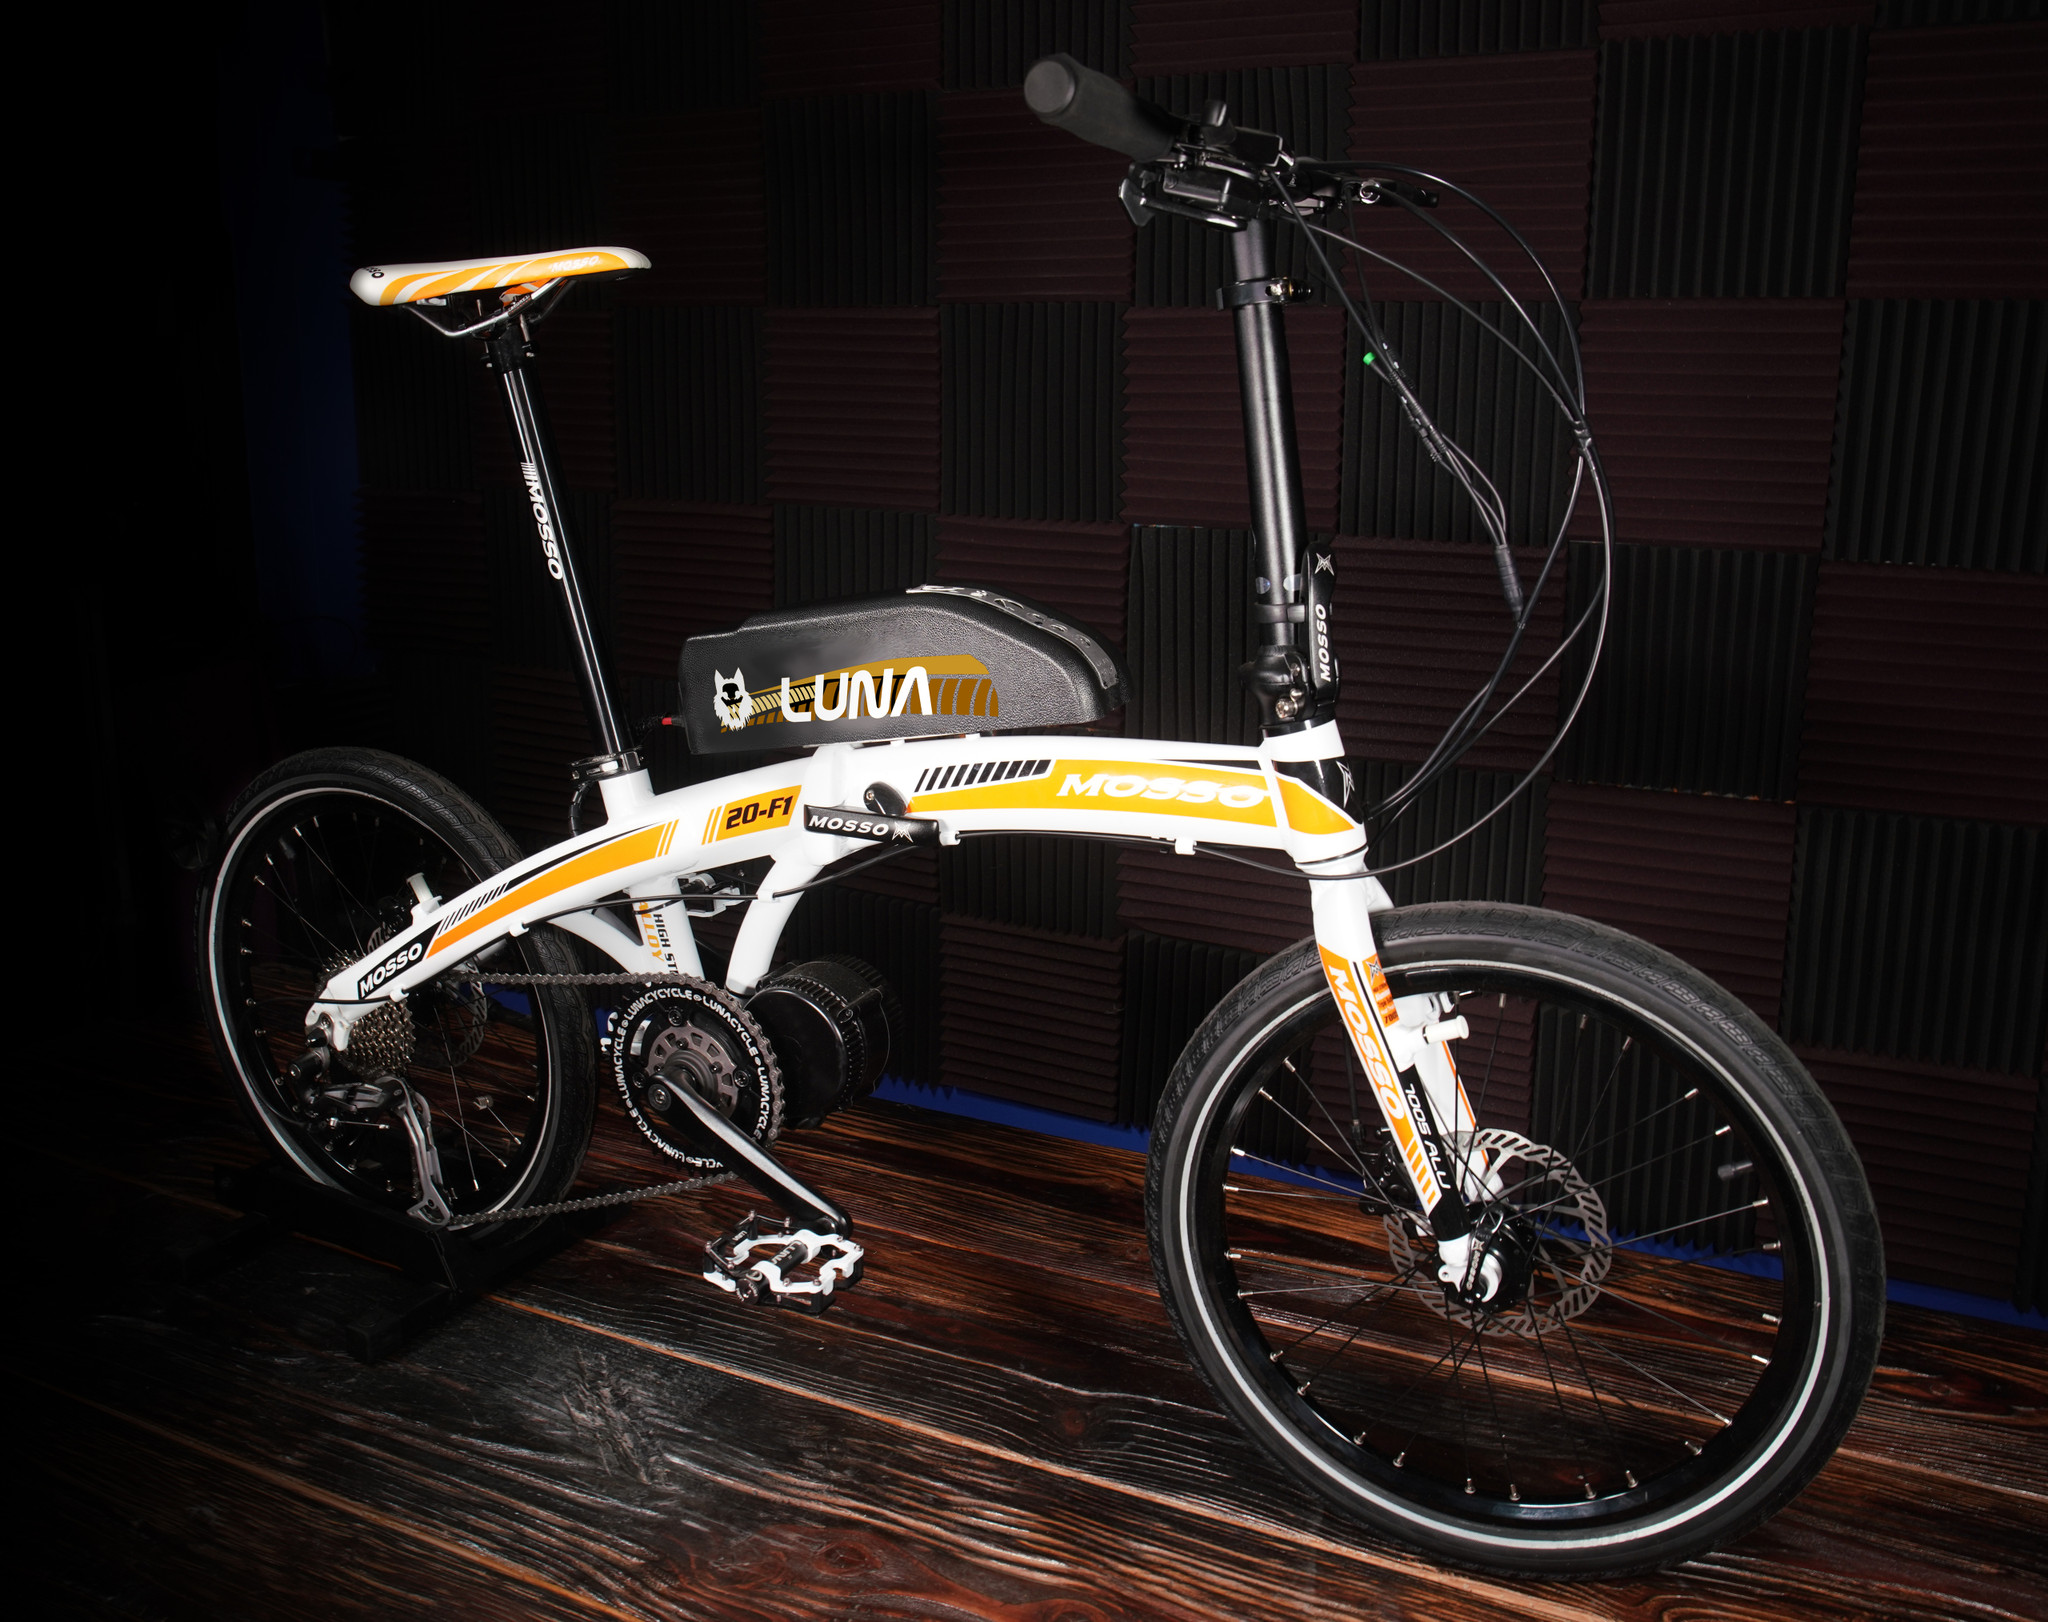 KEN /_0C Bike Bicycle Portable Bicycle Bike Chain Tool Pocket Size